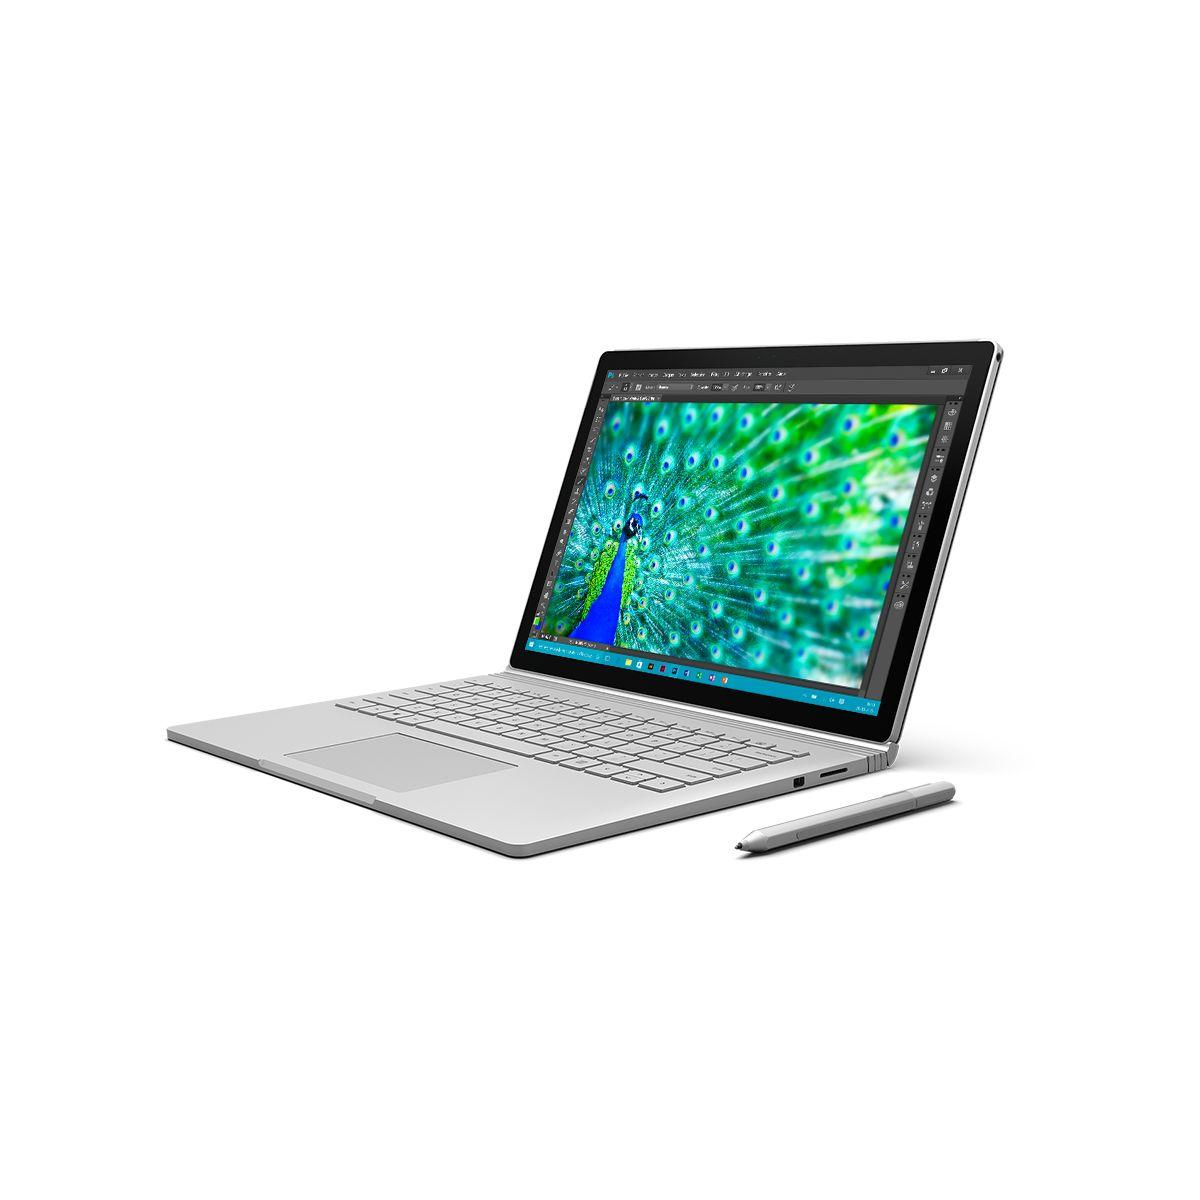 Microsoft surface book 128go i5 8go (photo)